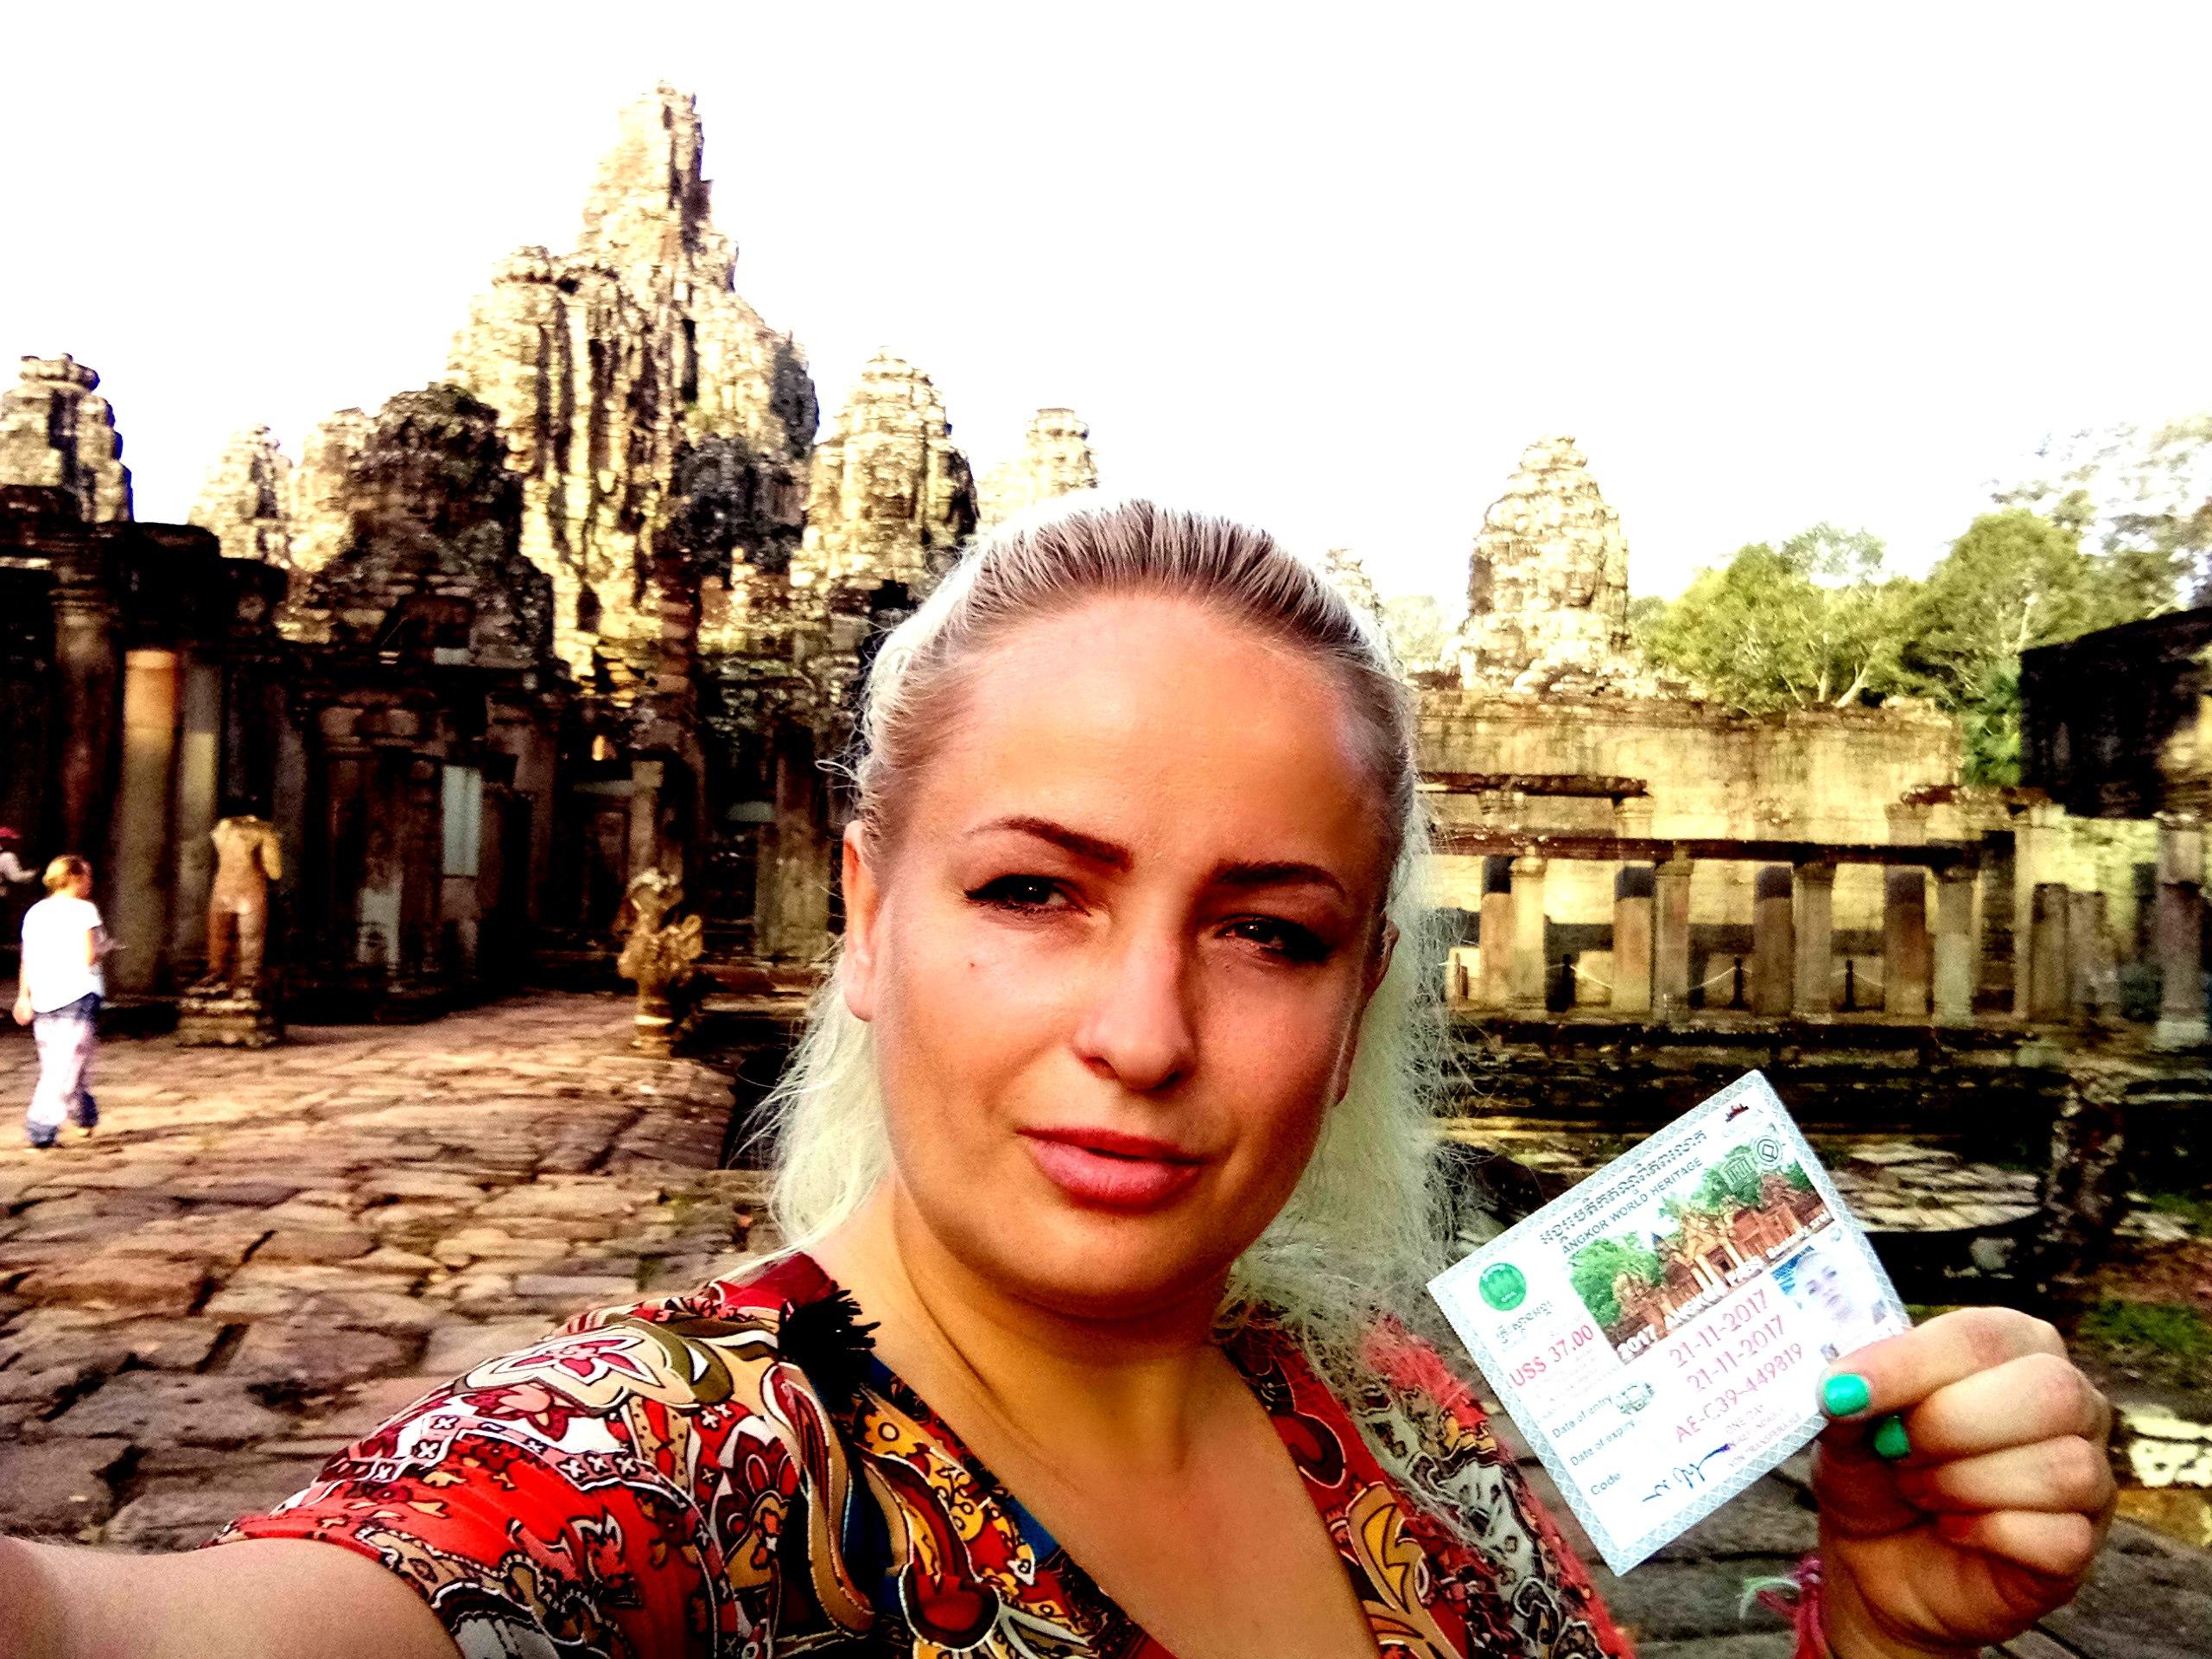 Елена Руденко (Валтея). Камбоджа. Ангкор. - Страница 2 LcR_XzBkj3M